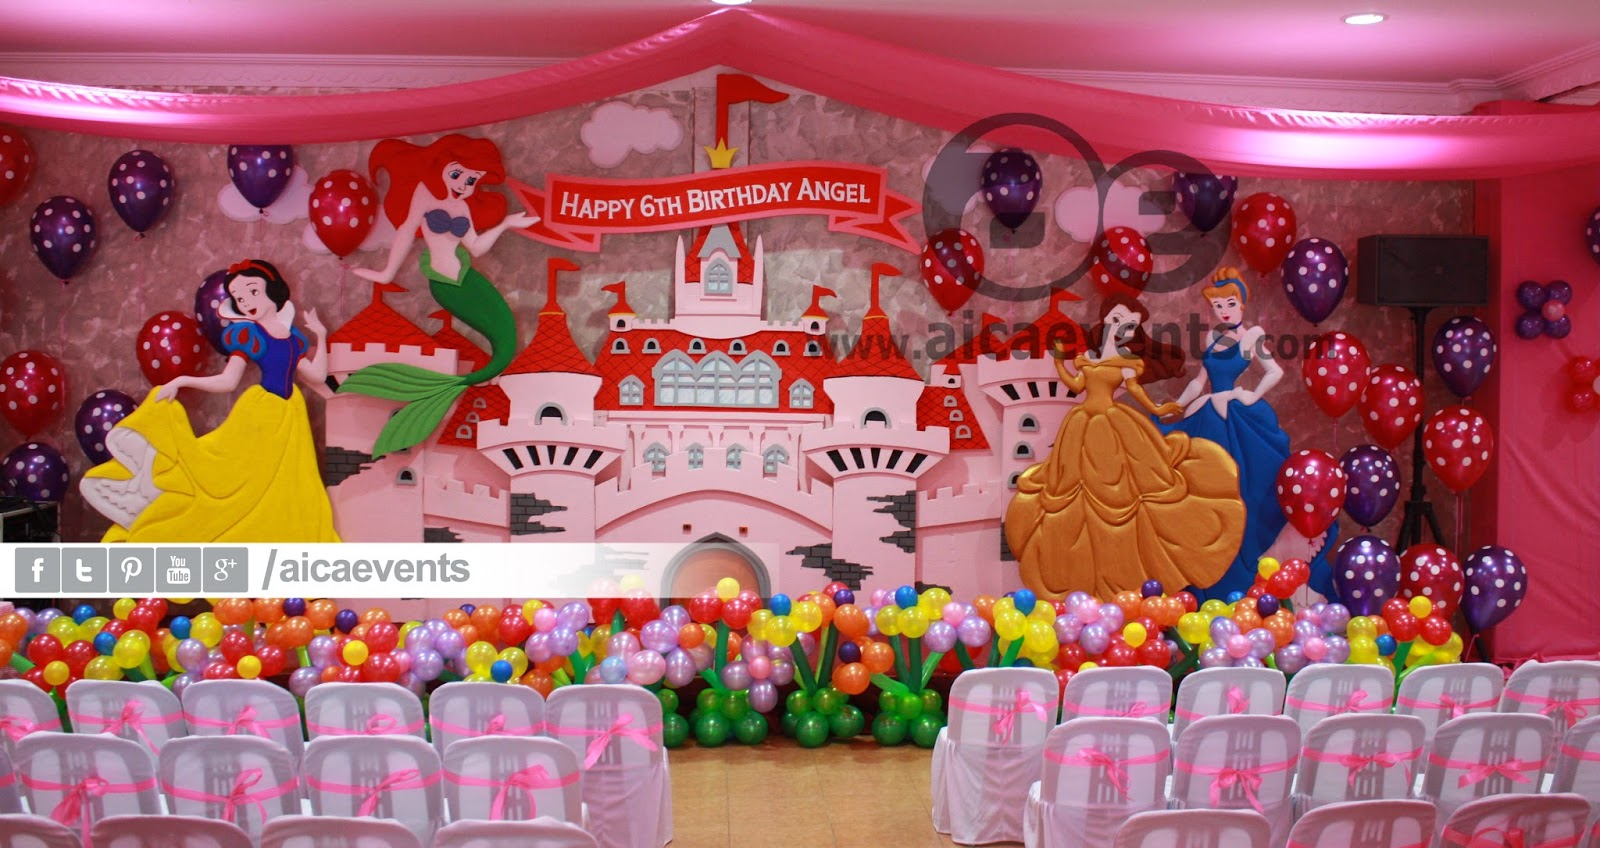 Princess Balloon Decoration Aicaevents Castle And Princess Theme Decorations